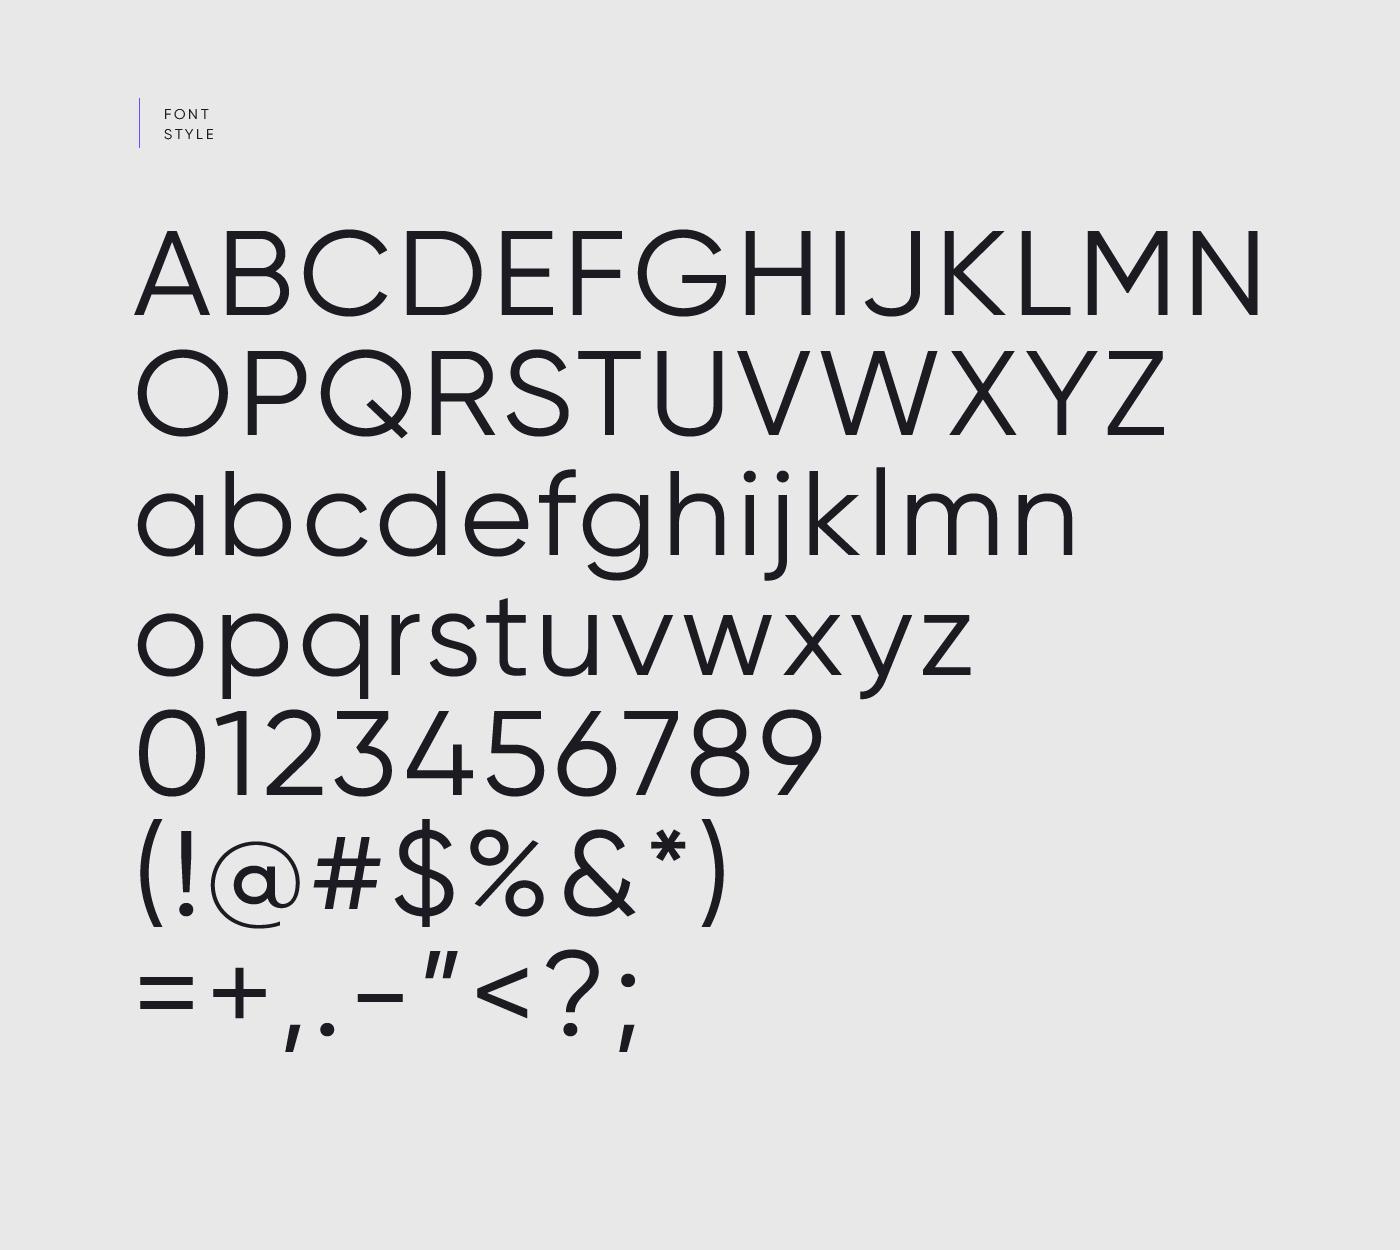 Helvetica ultra light free download | Helvetica* Ultra Light